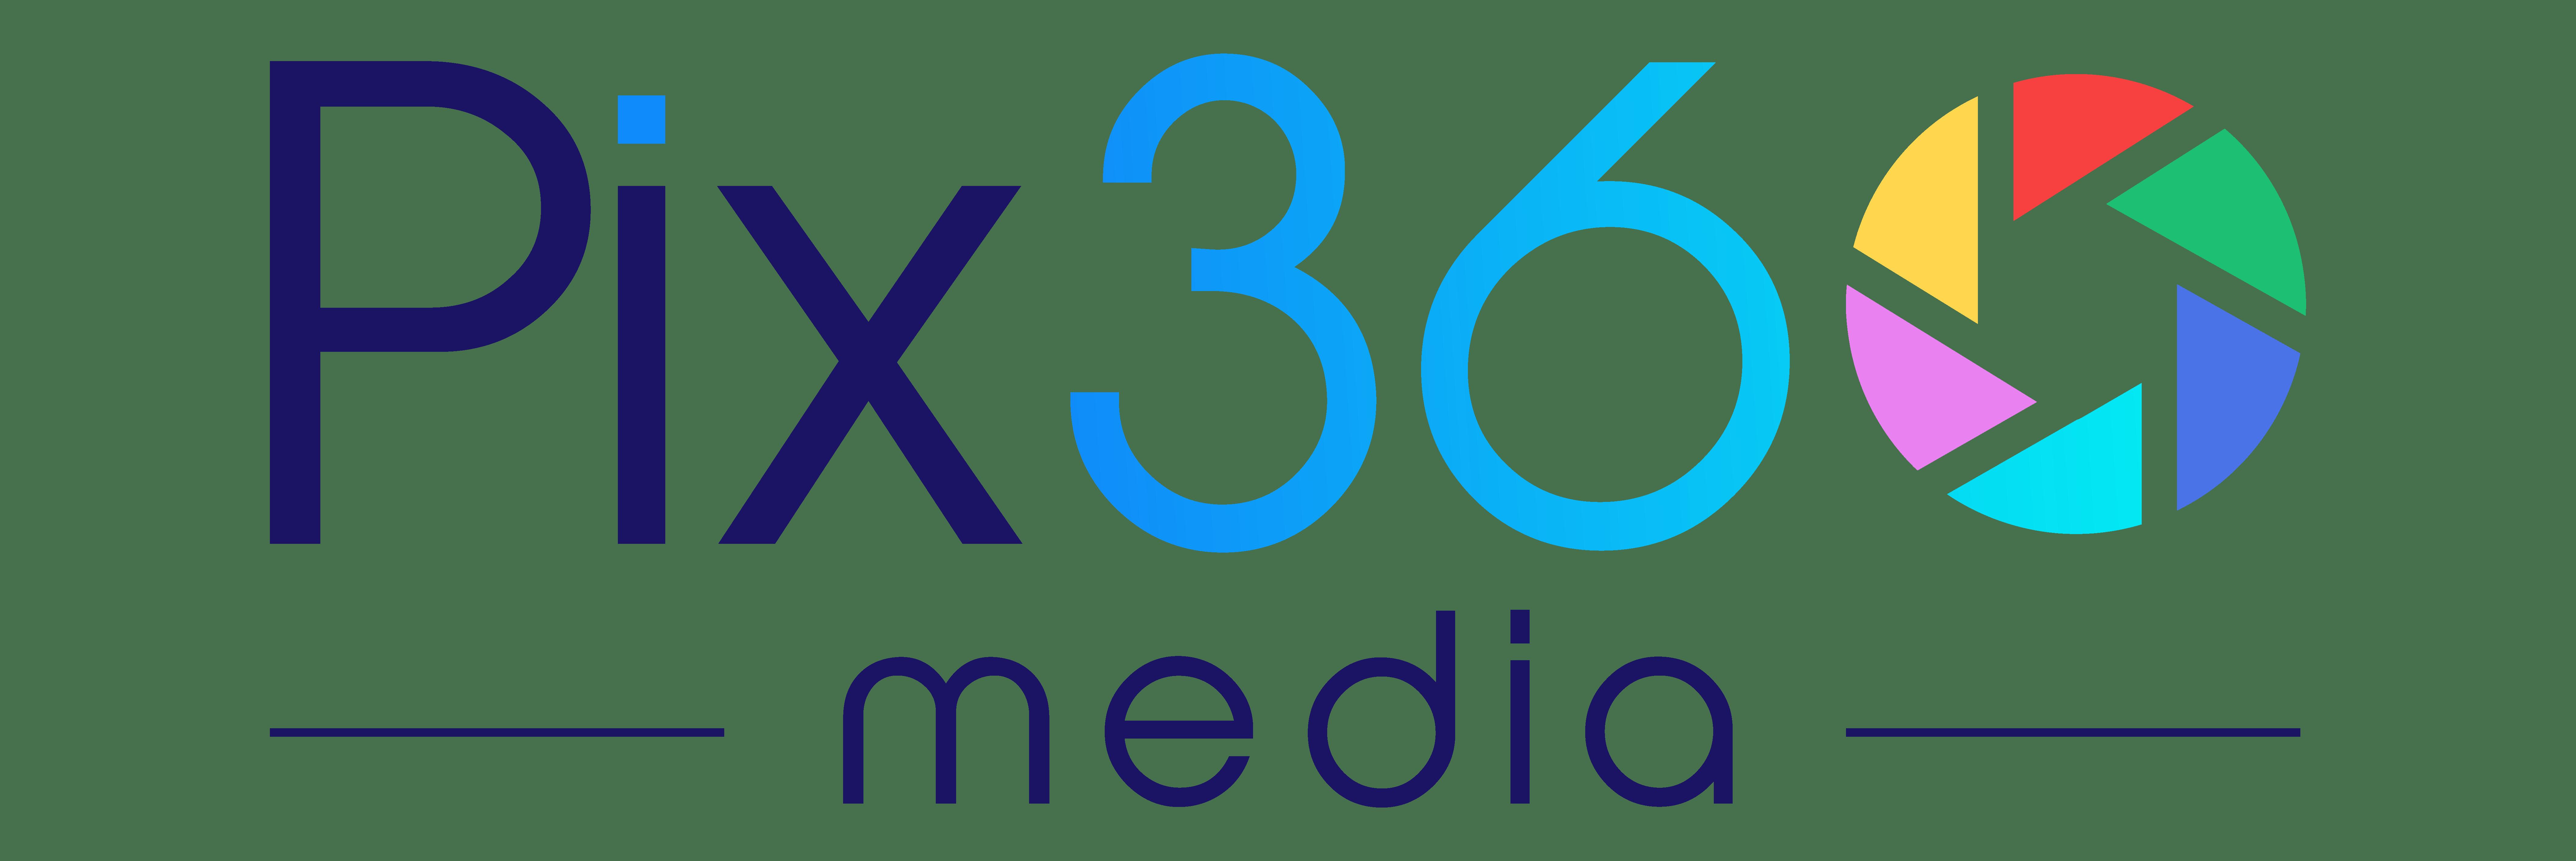 Pix360 Media